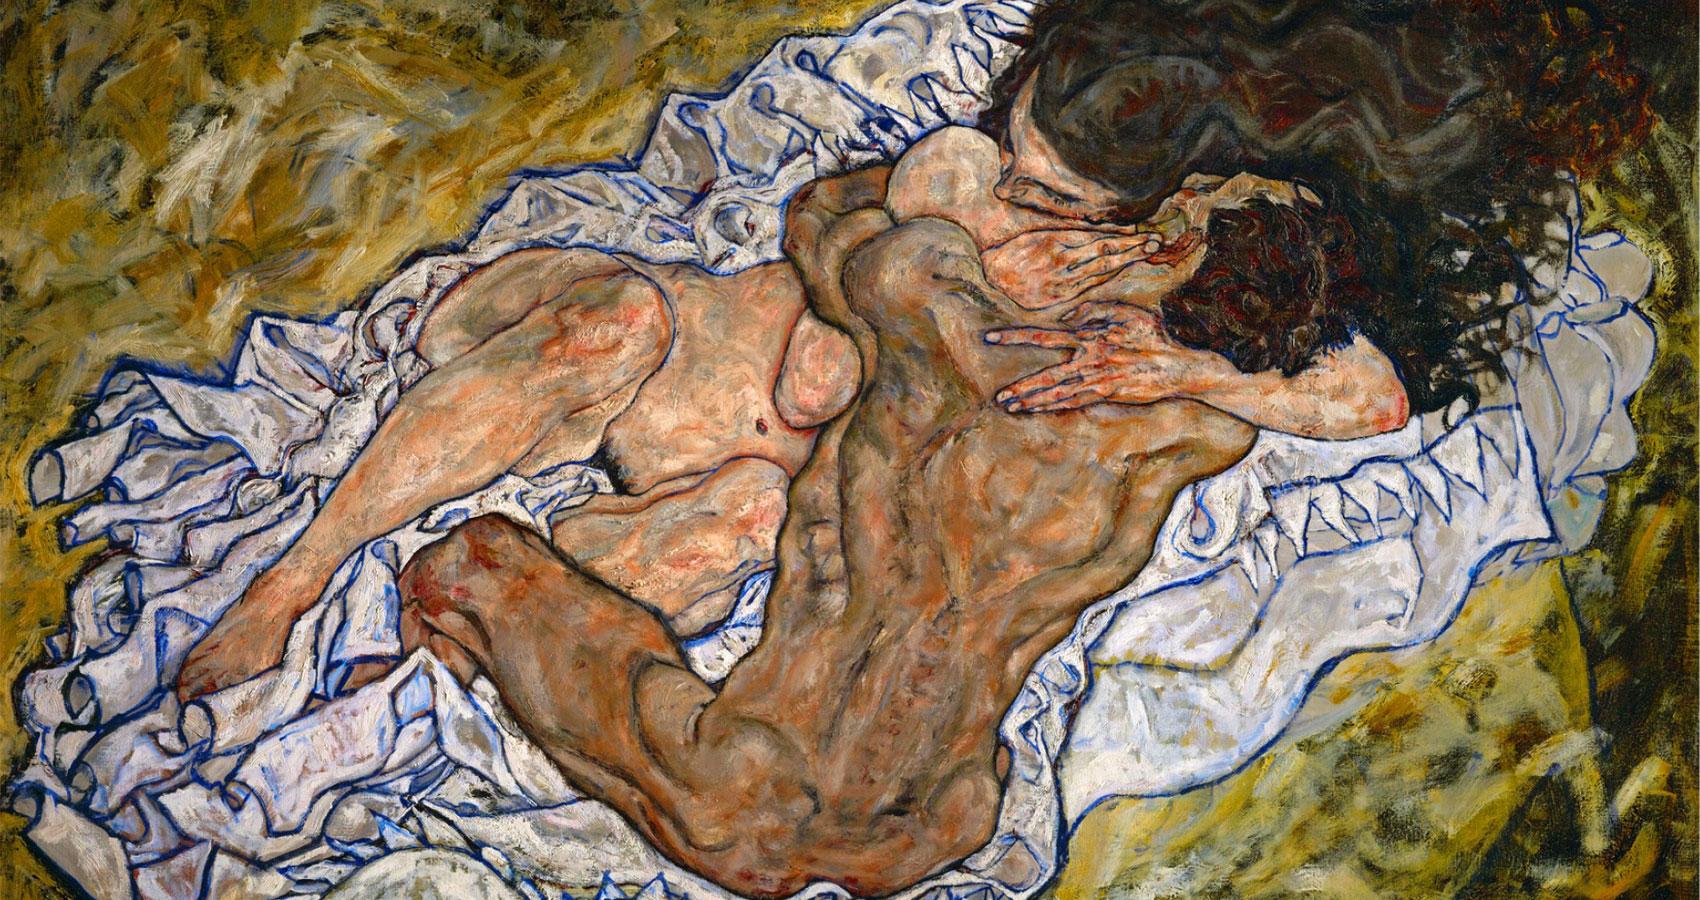 Schiele's Embrace, poem written by Henry Bladon at Spillwords.com